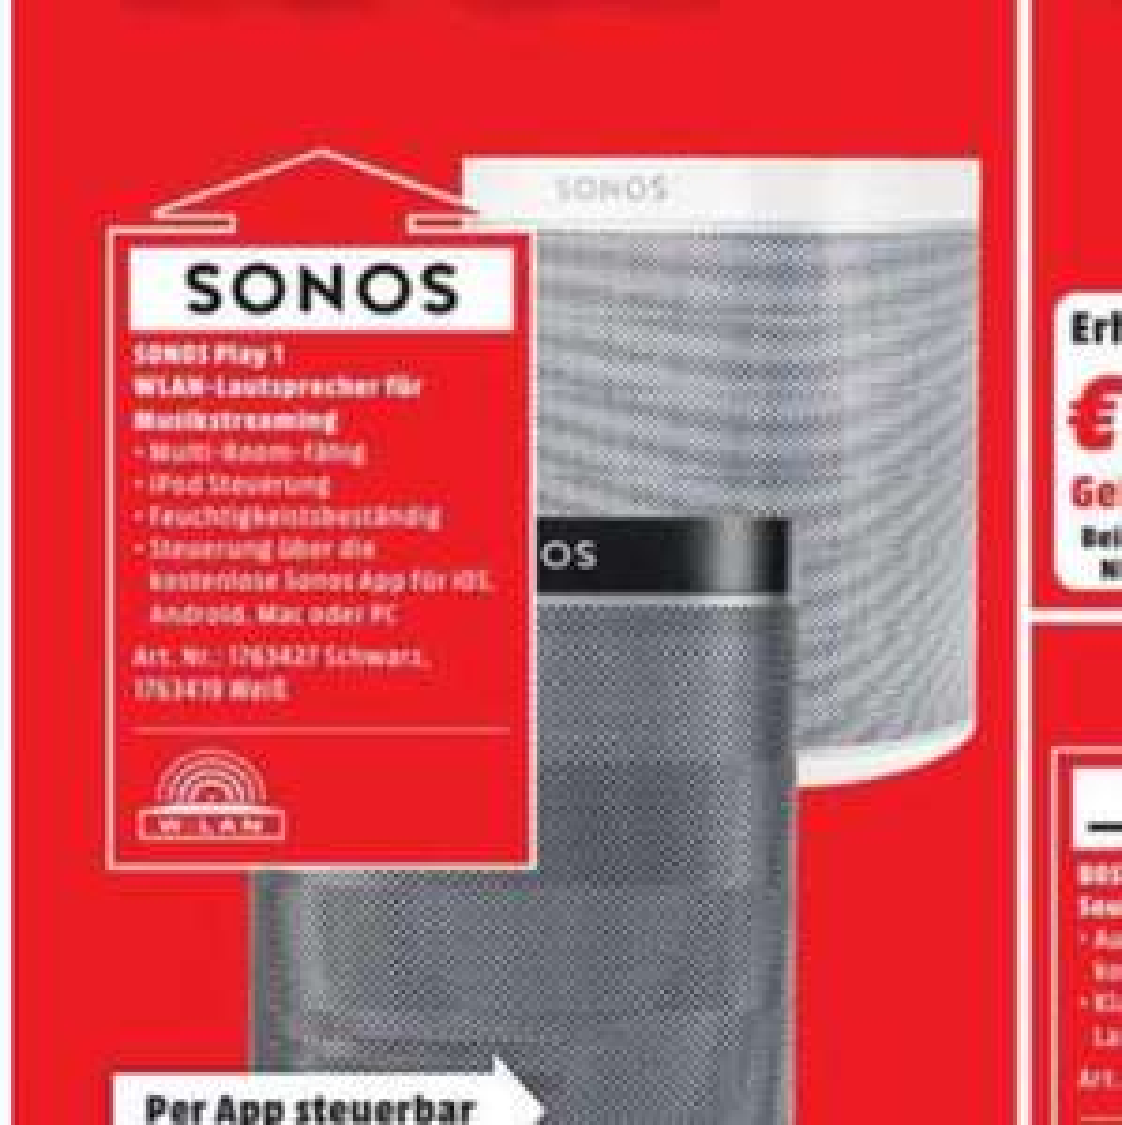 [Lokal] München Media Markt München Sonos Play 1